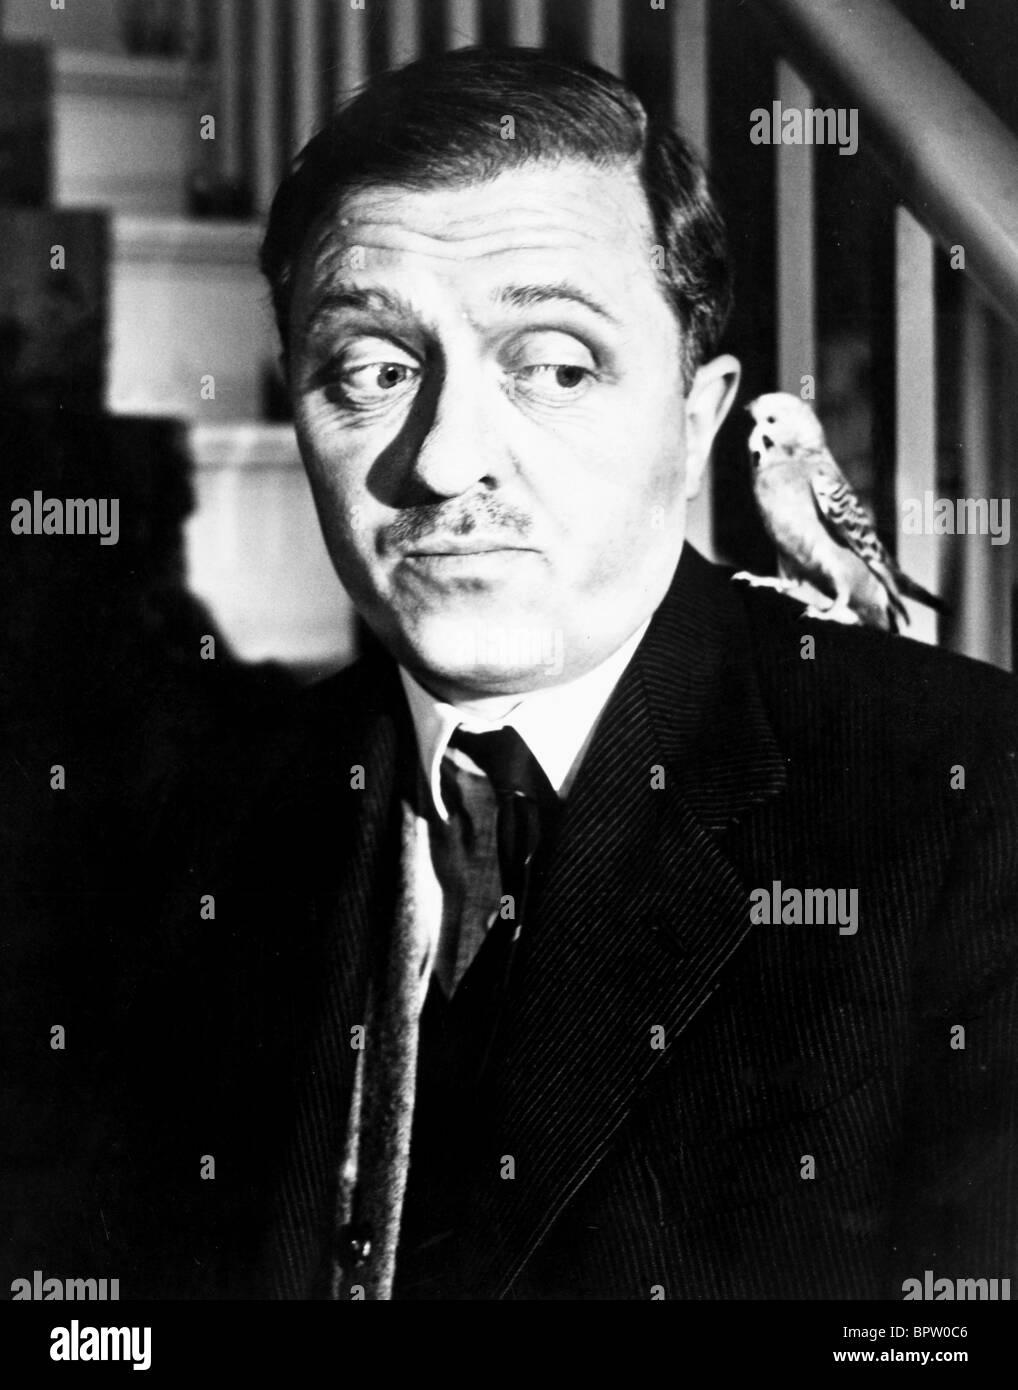 RICHARD ATTENBOROUGH ACTOR (1968) - Stock Image